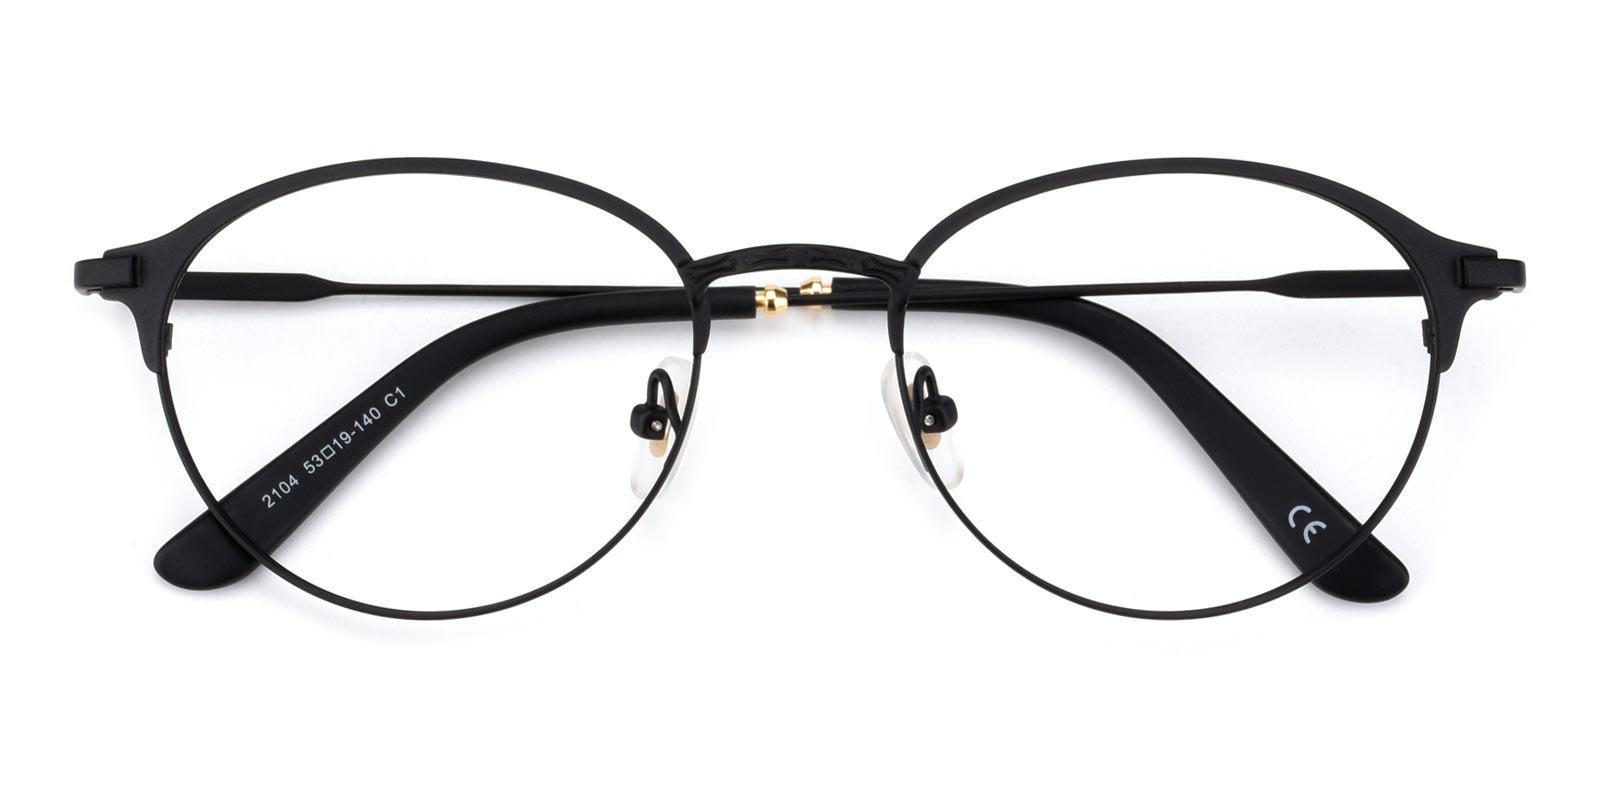 Irvin Black Metal Eyeglasses , Fashion , NosePads Frames from ABBE Glasses